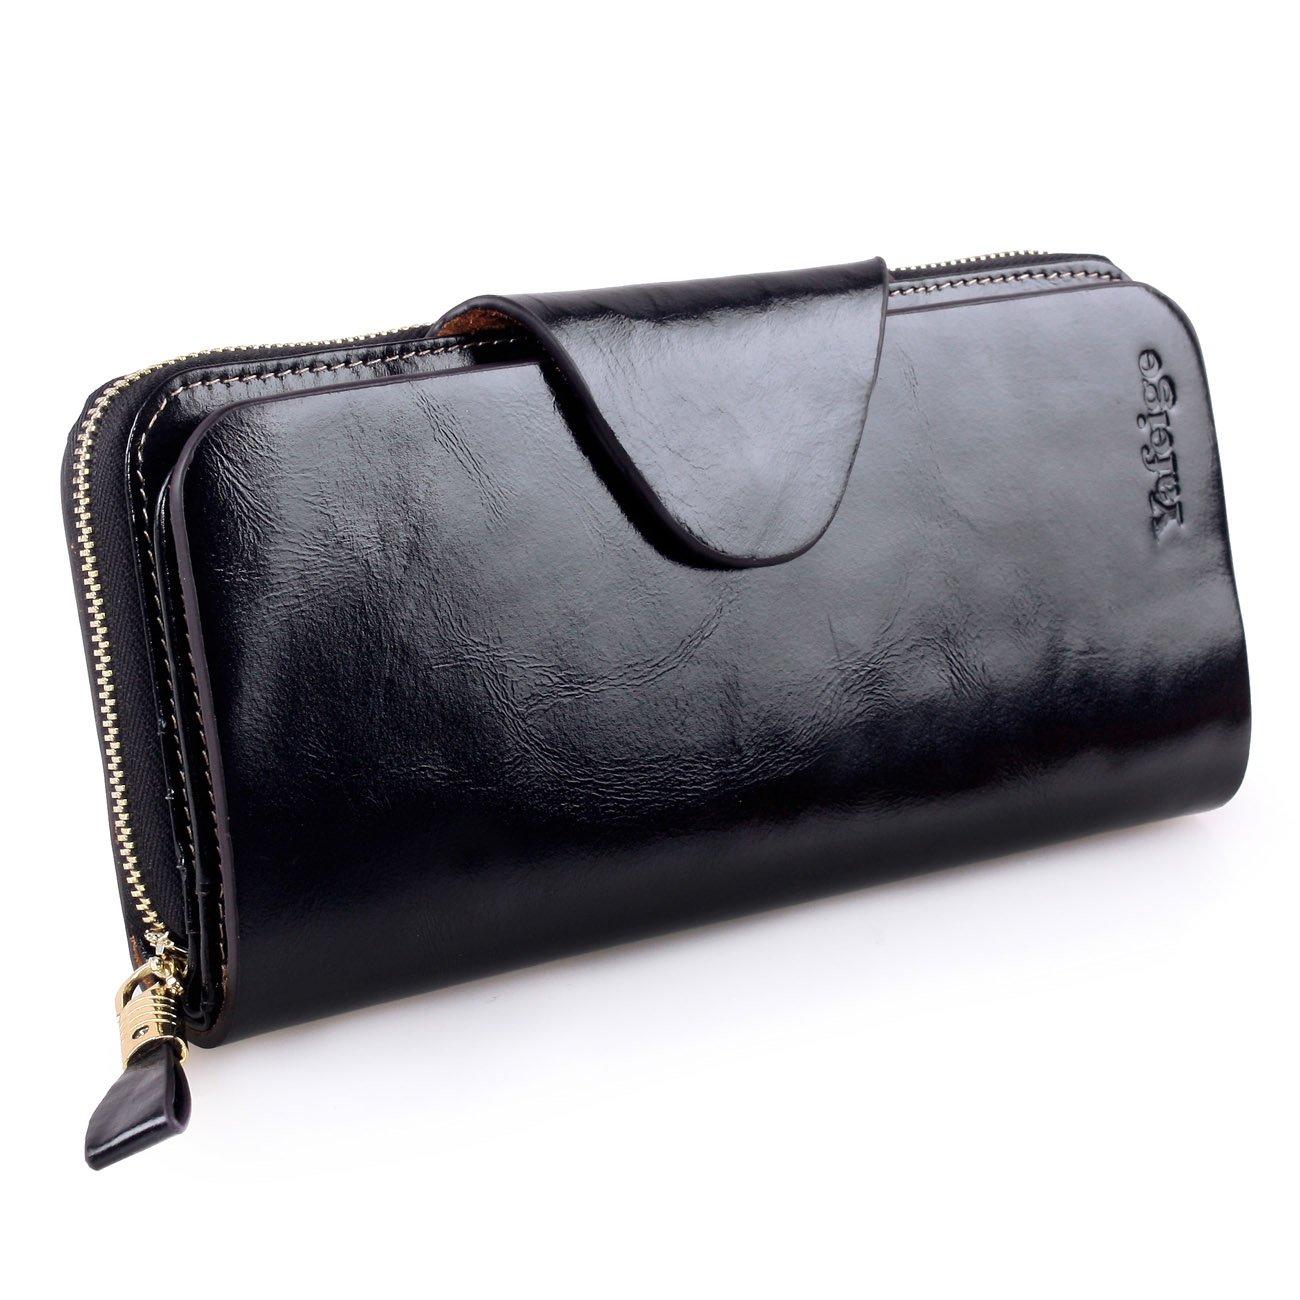 Yafeige Large Luxury Women's RFID Blocking Tri-fold Leather Wallet Zipper Ladies Clutch Purse(Black)